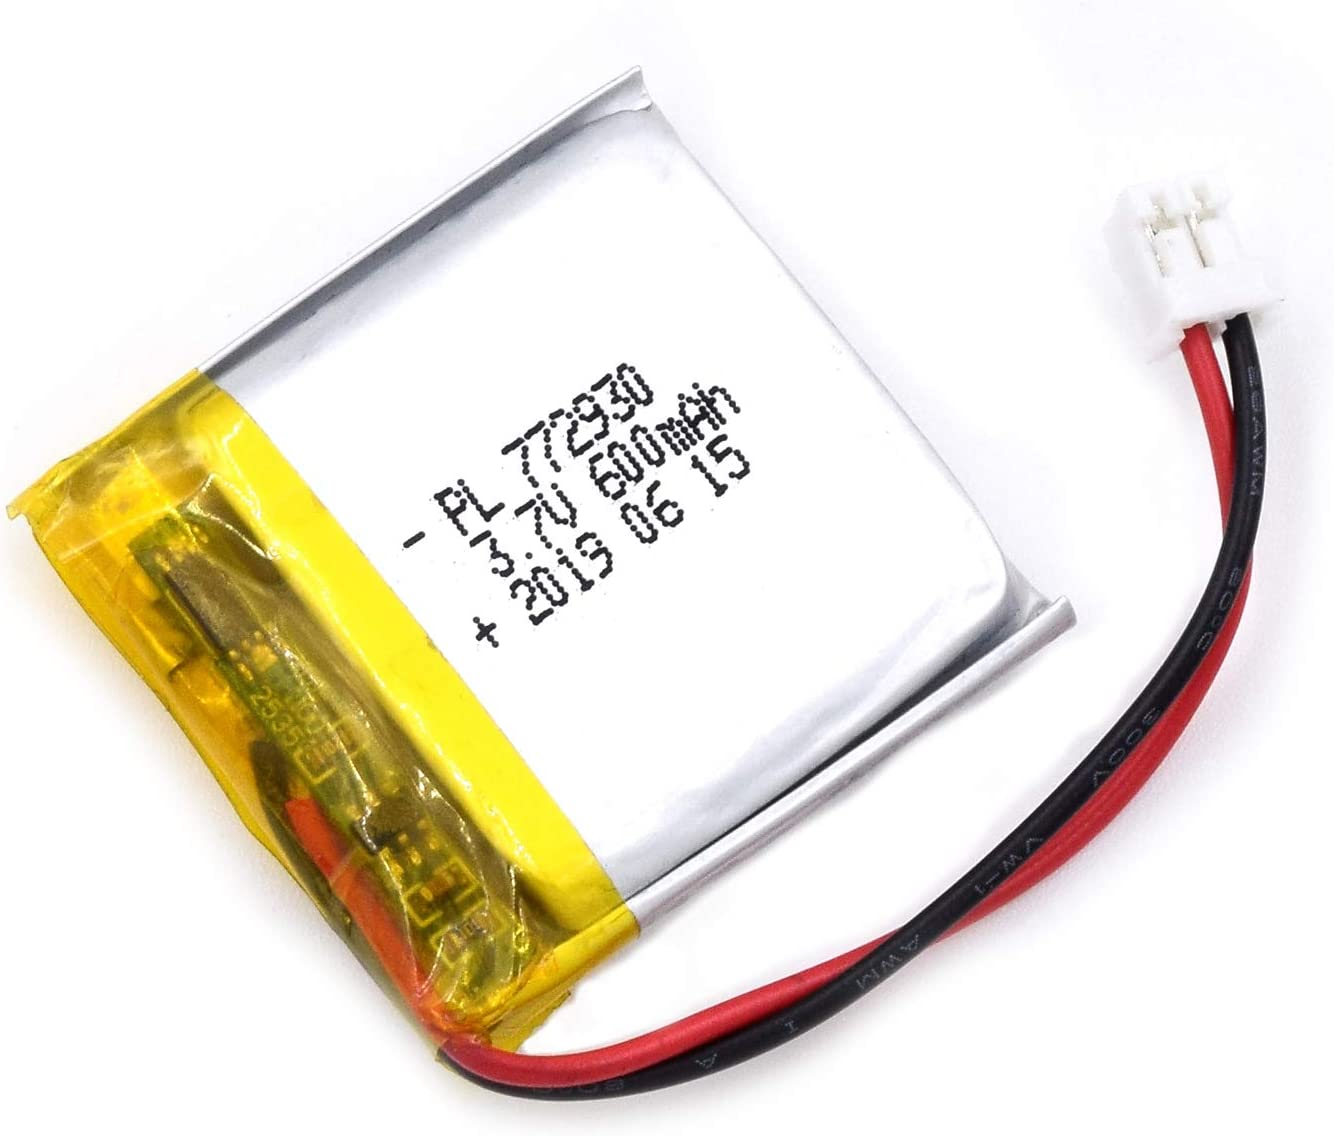 Battery For GARMIN 010-01626-02,Edge 200,Edge 205,Edge 500,Edge 520, VINTRONS